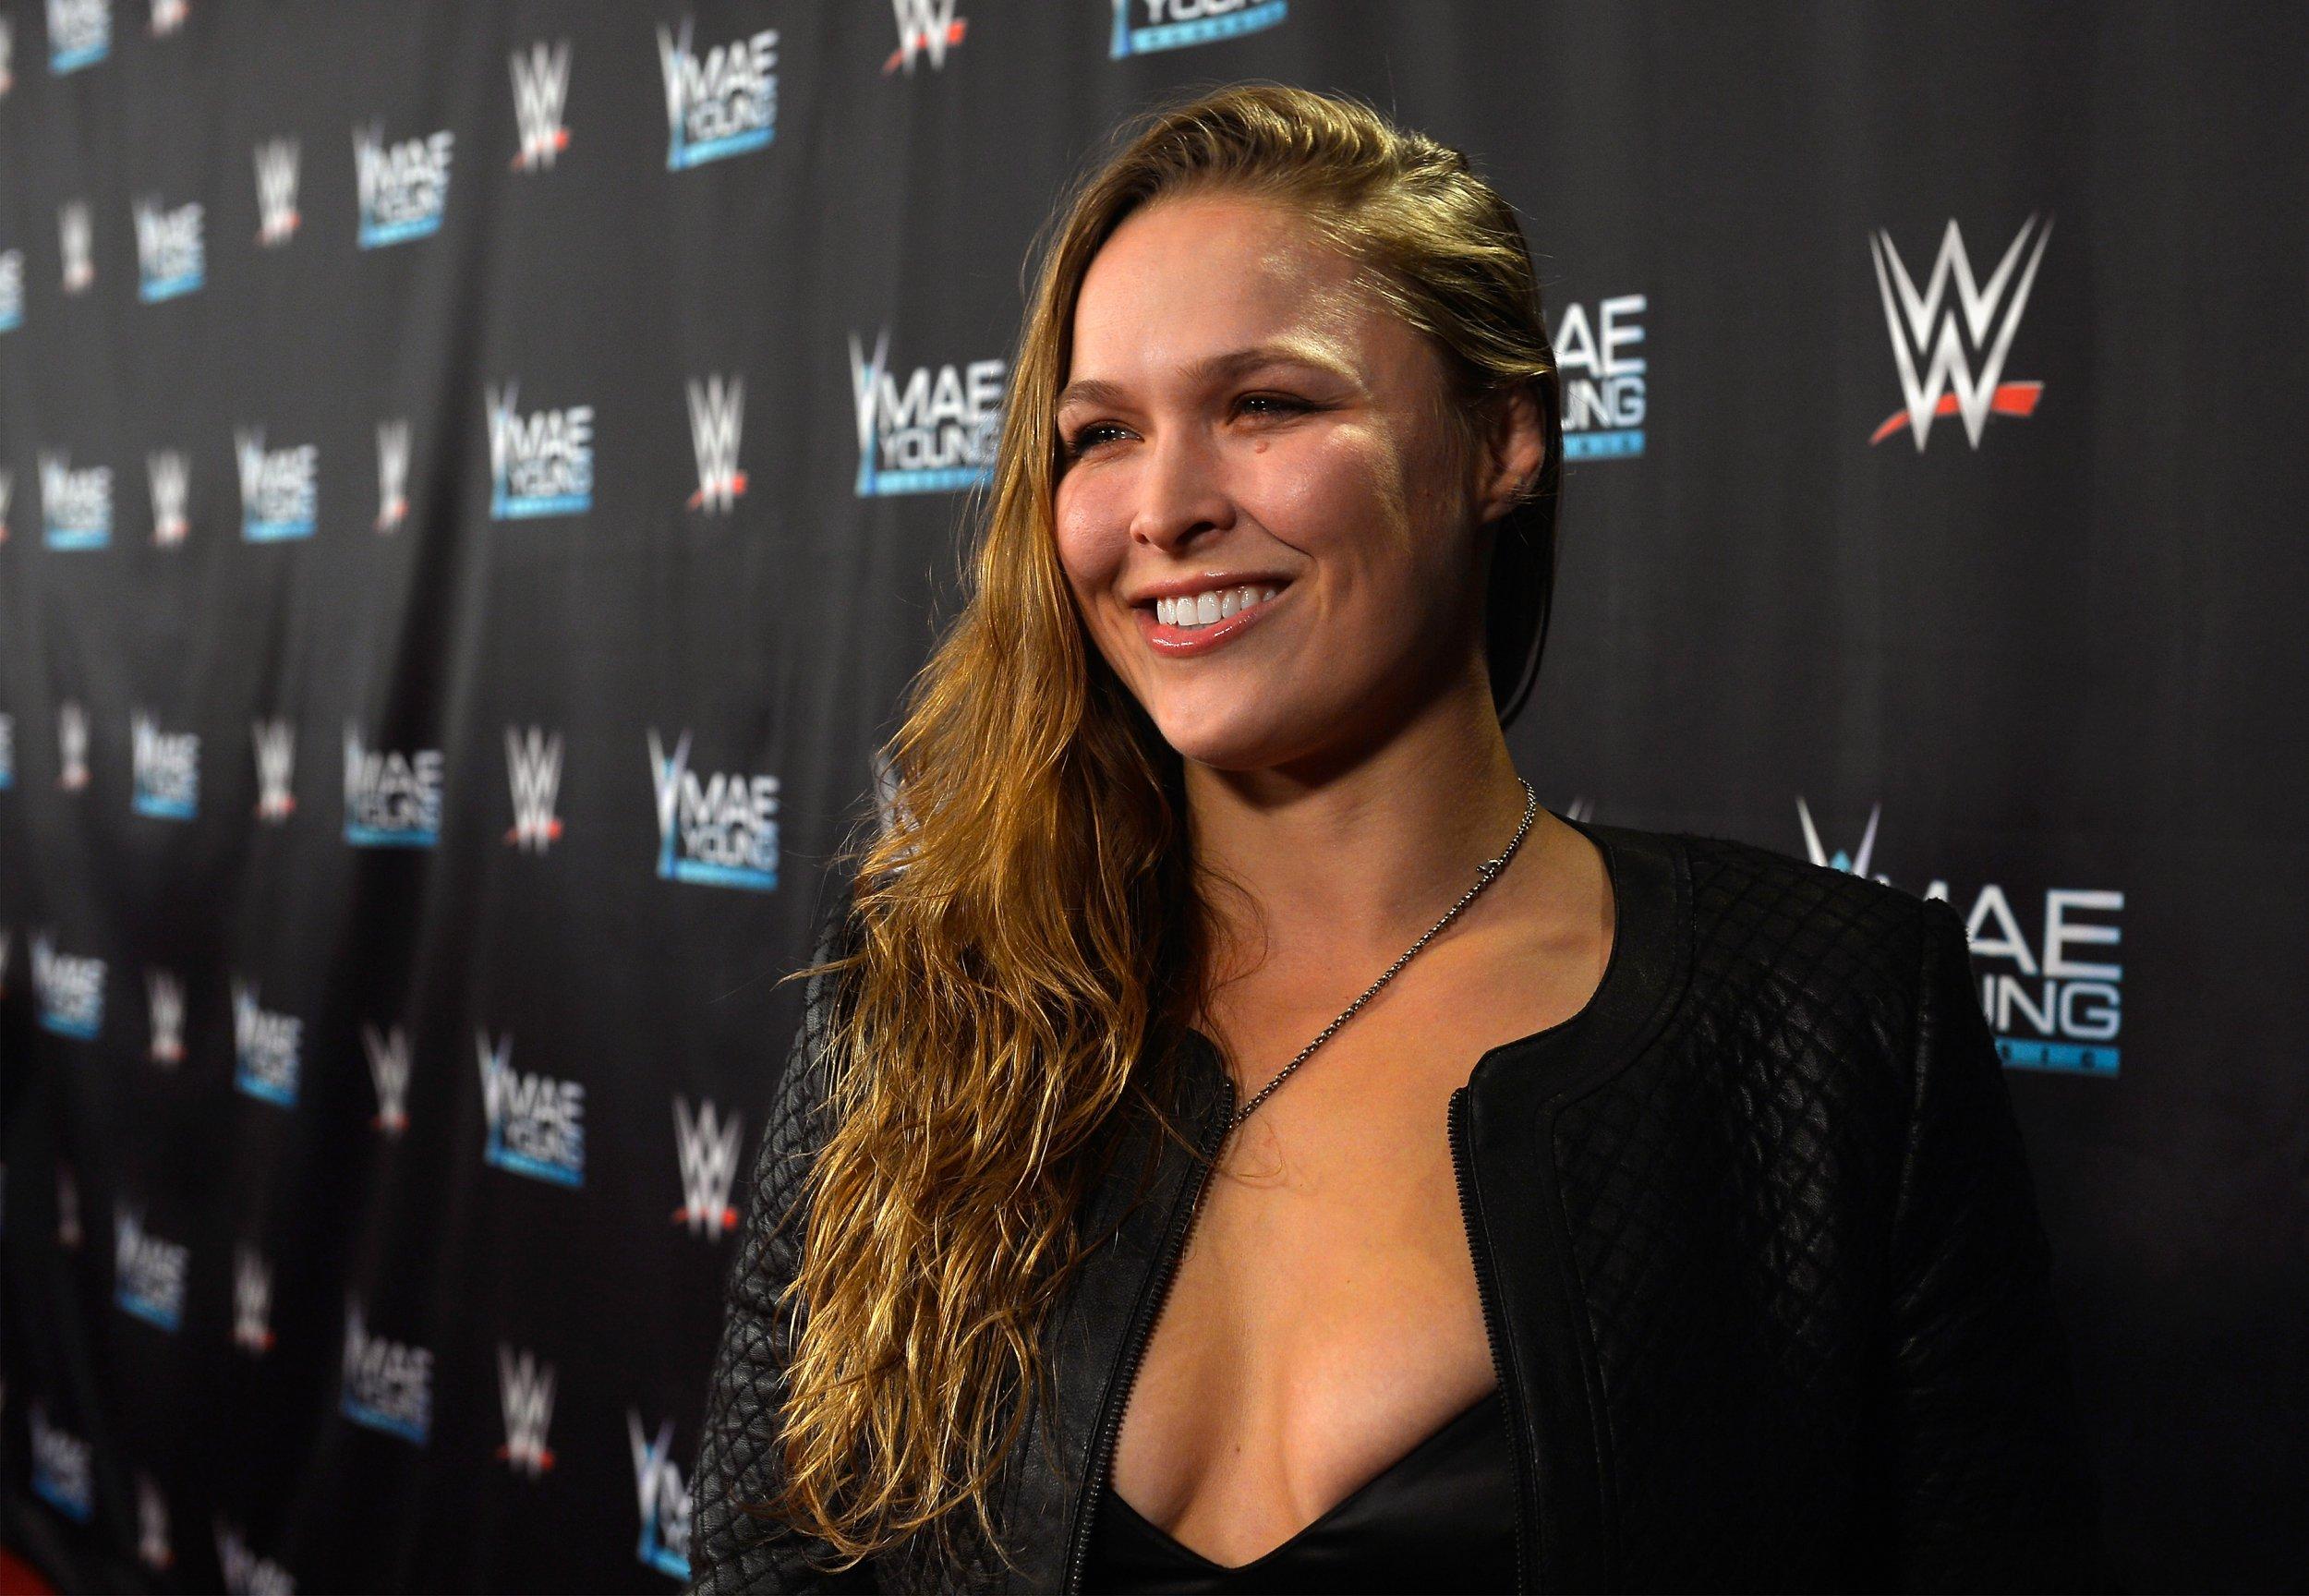 Ronda Rousey joining WWE?